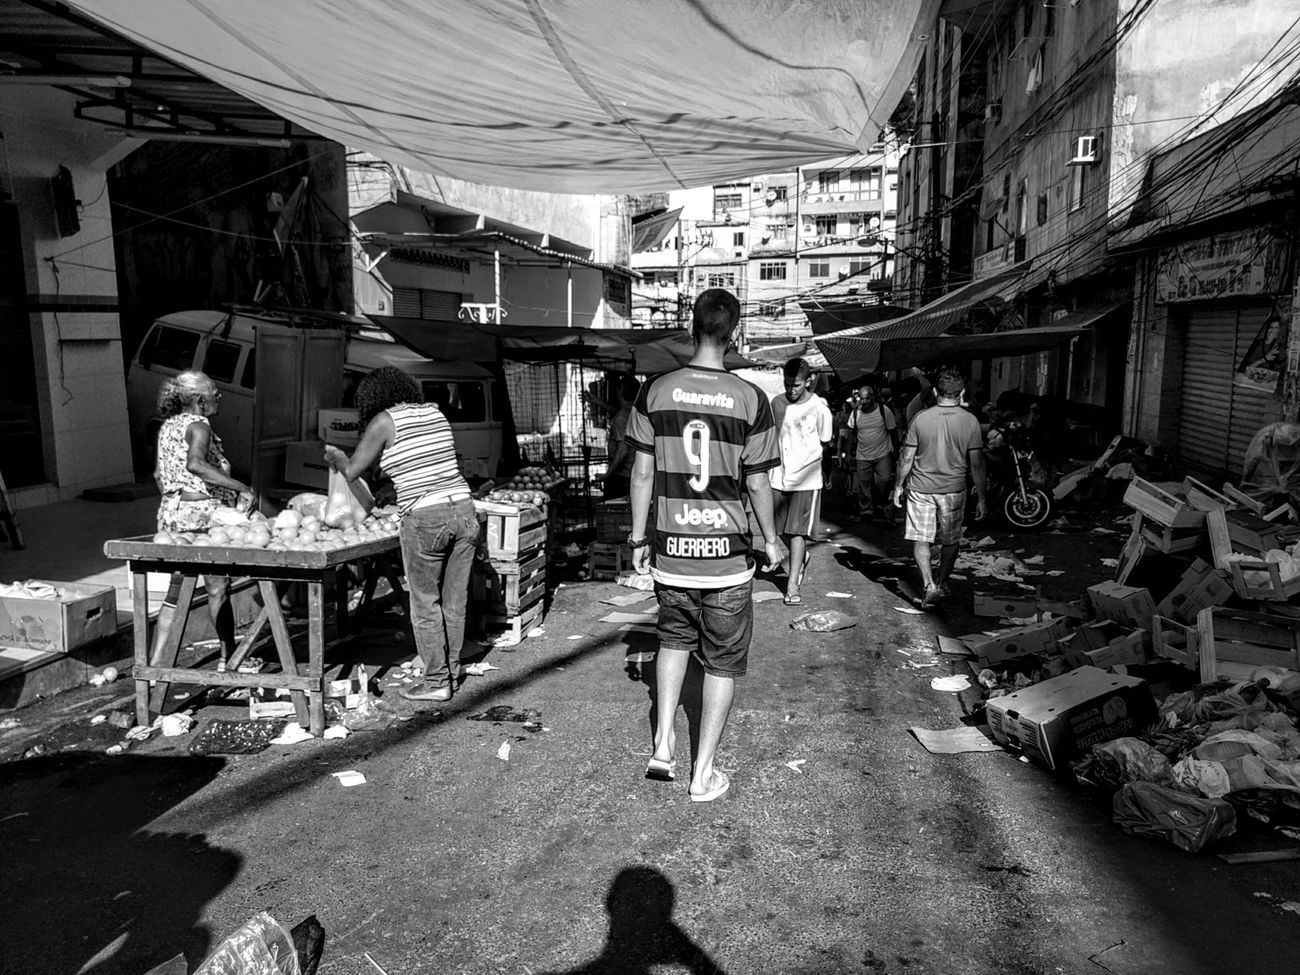 Blackandwhite Blackwhite Streetphoto_bw Blacknwhite B&w Street Photography Black And Write Streetphotography Shadows & Lights EyeEmNewHere